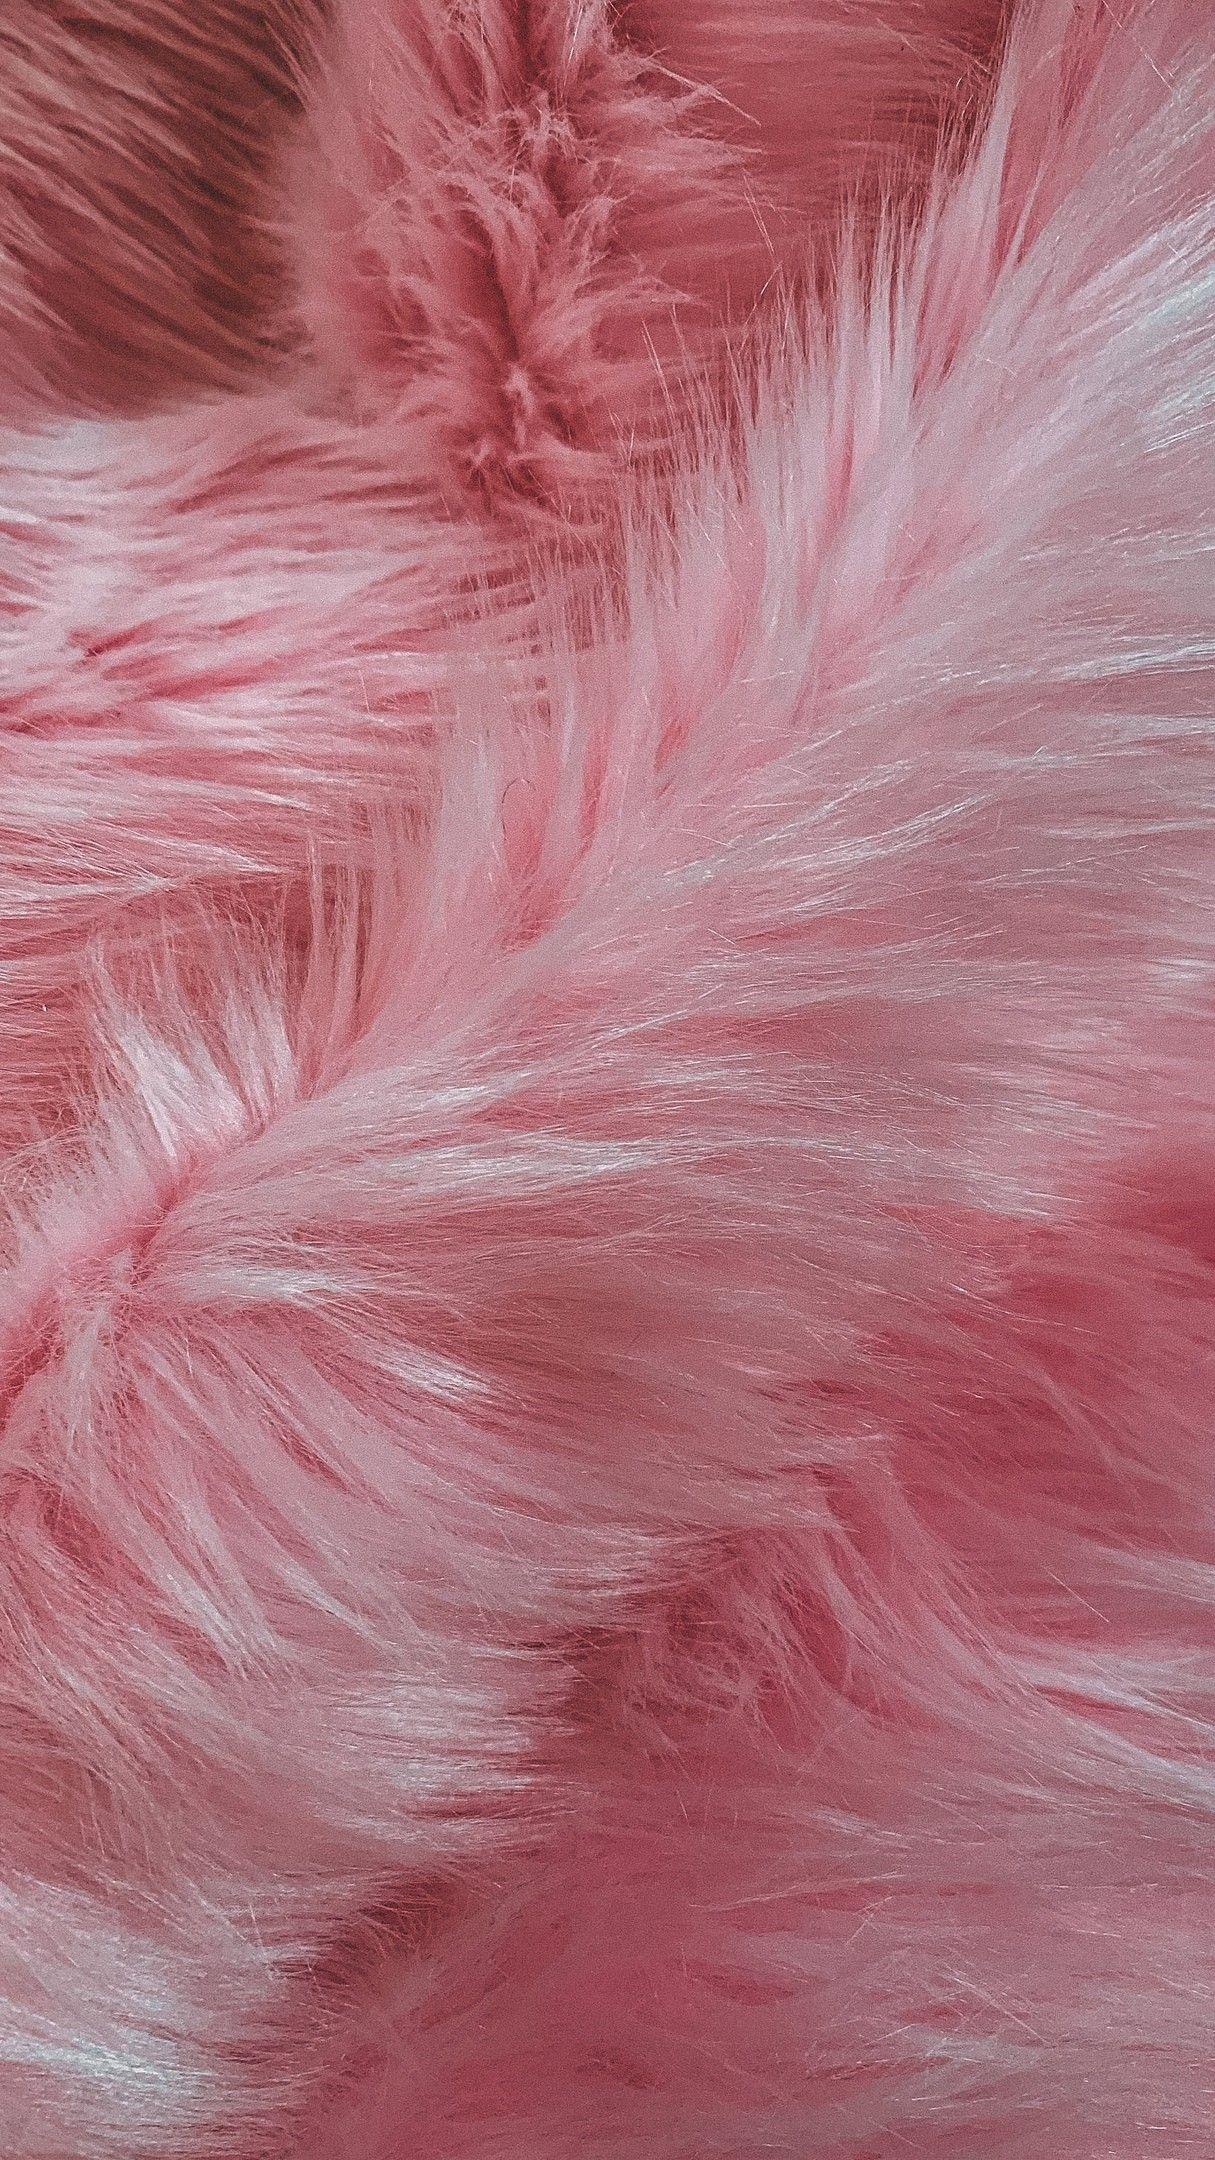 Pin De Ajsaka Tajga Em Fony Papel De Parede Cor De Rosa Imagem De Fundo Para Android Papel De Parede De Seda Aesthetic pink fur wallpaper hd